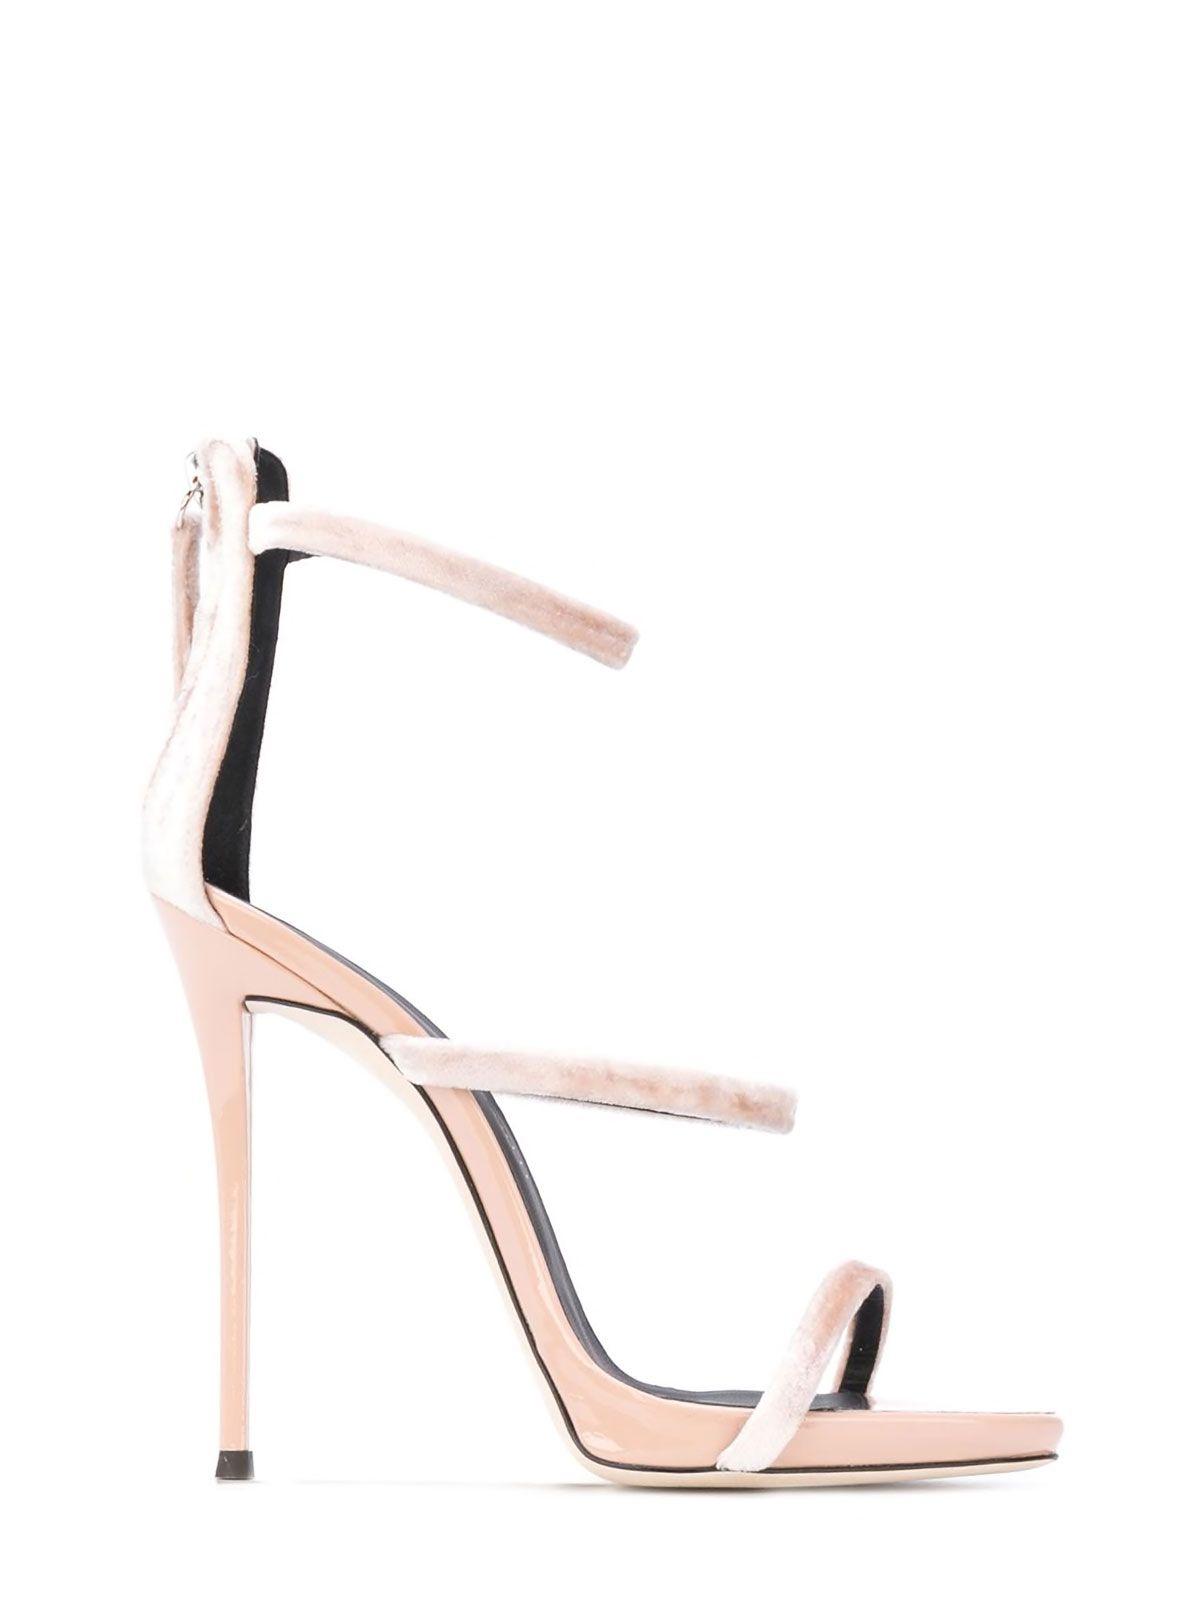 Giuseppe Zanotti Pink Leather Heels